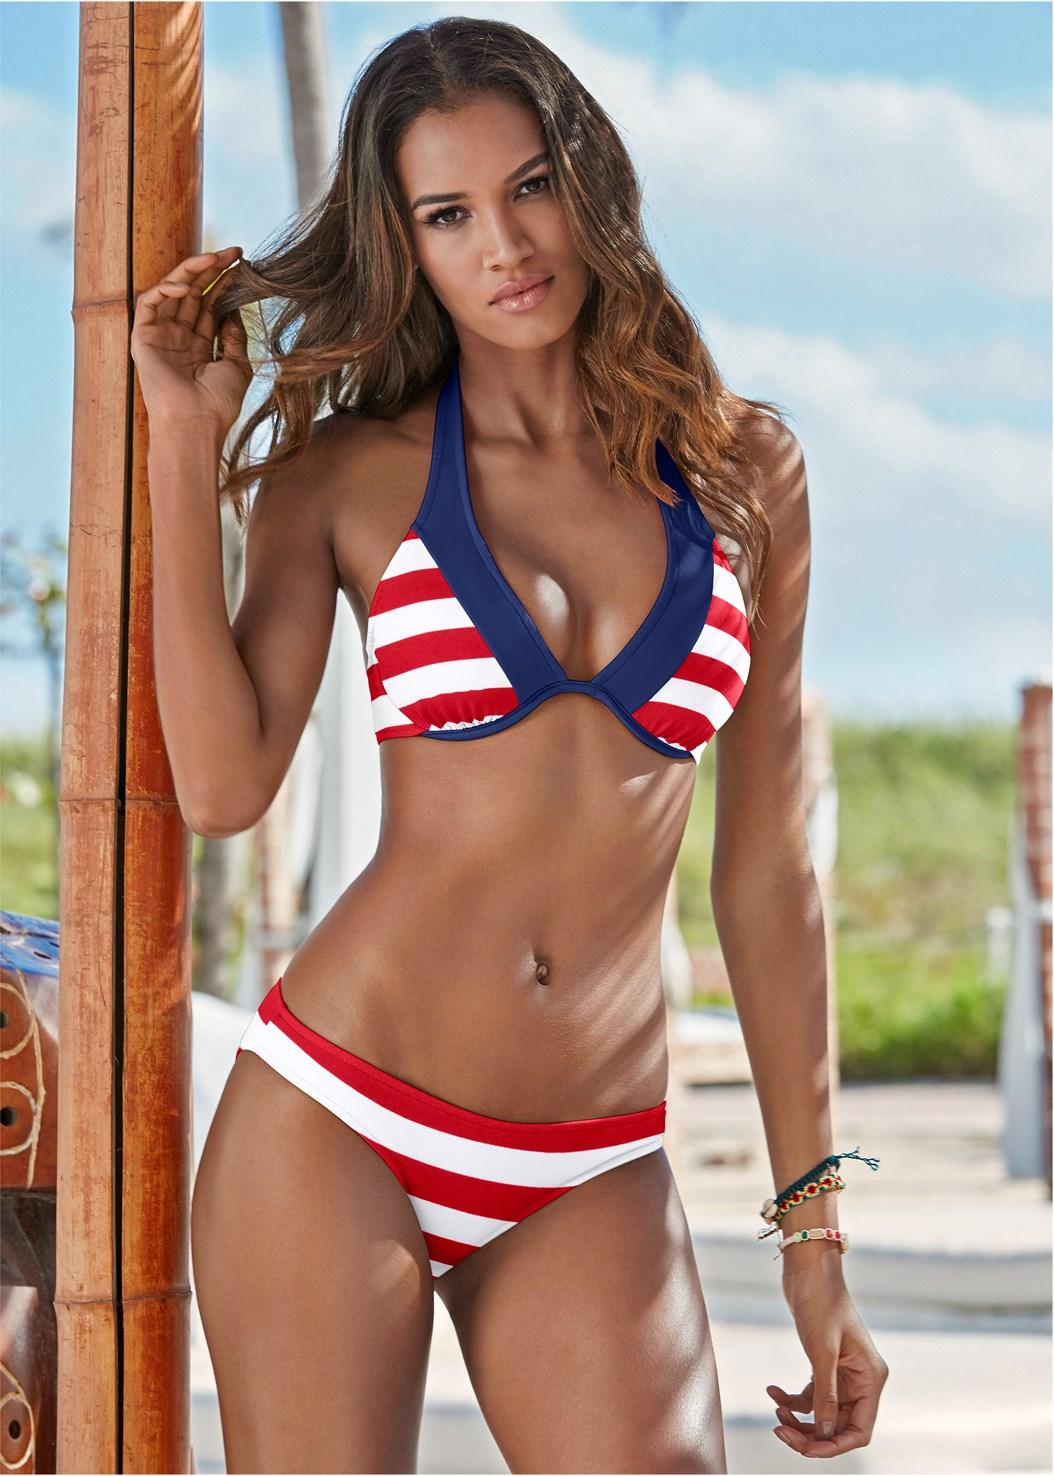 Underwire Halter Bikini Top,Low Rise Bikini Bottom,Scoop Front Classic Bikini Bottom ,String Side Bikini Bottom